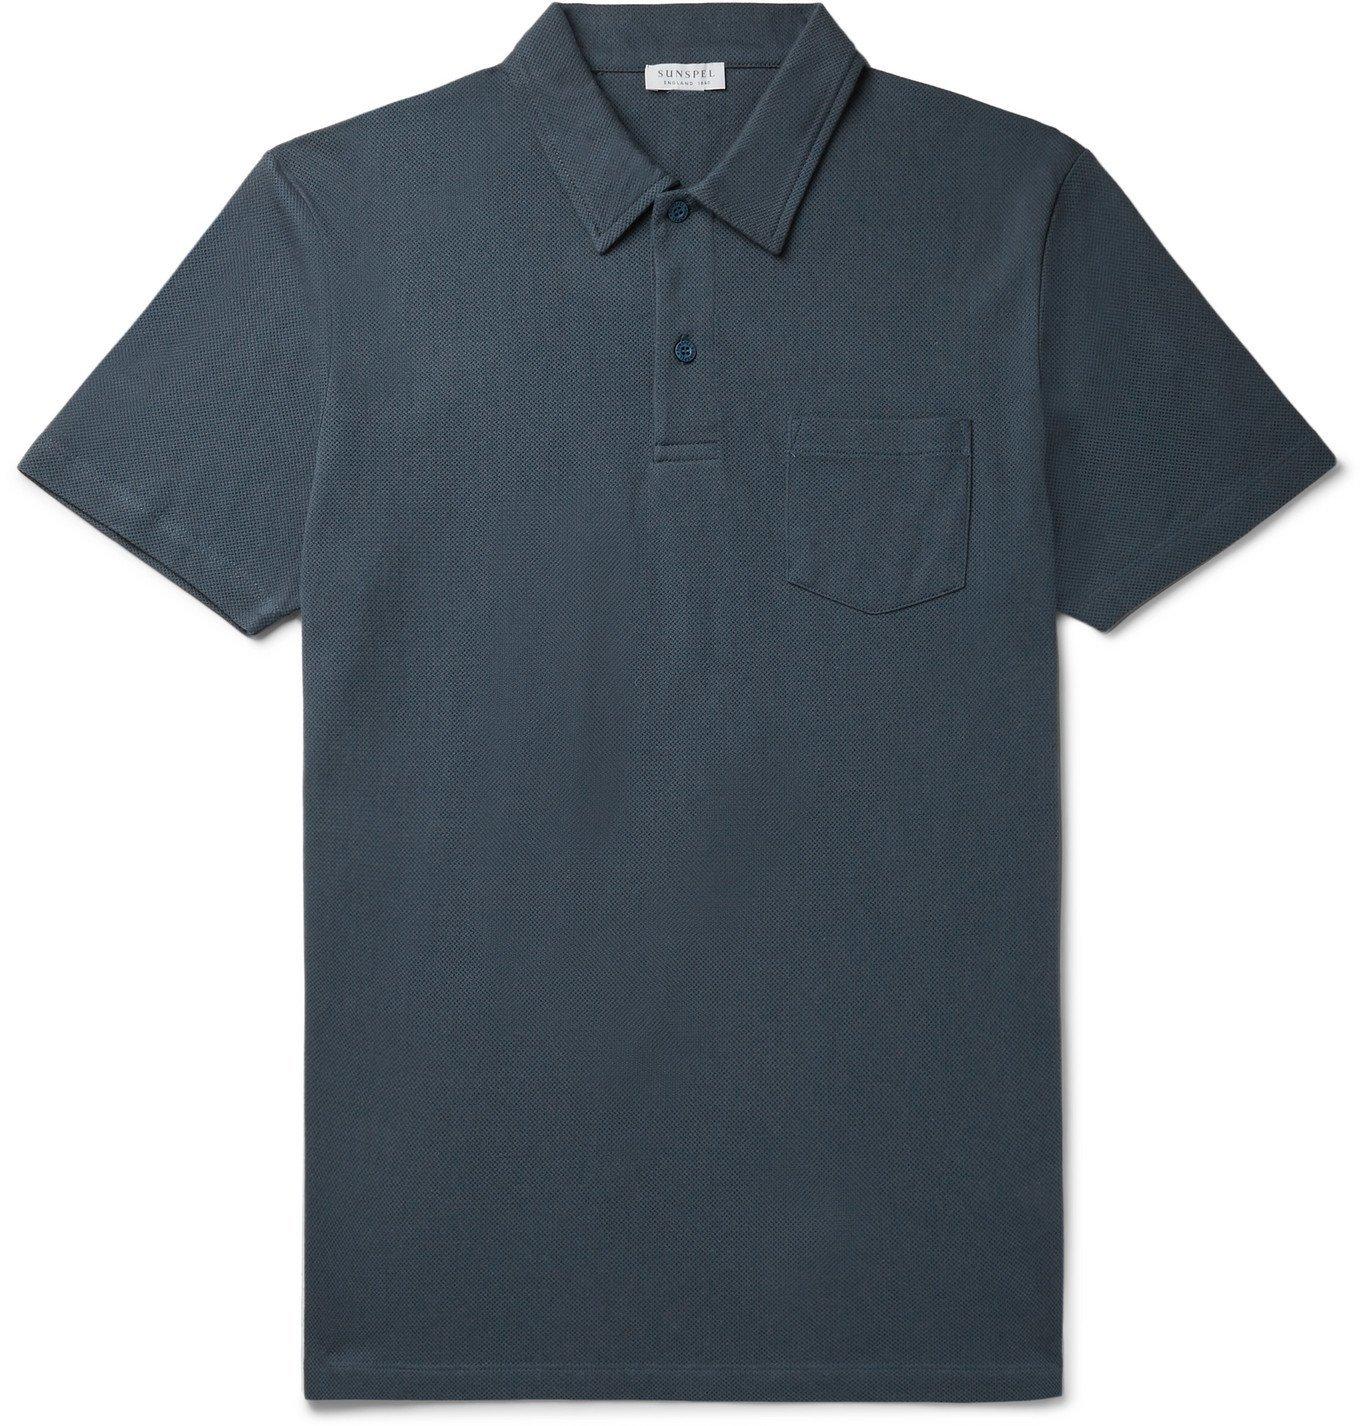 Sunspel - Riviera Slim-Fit Cotton-Mesh Polo Shirt - Blue